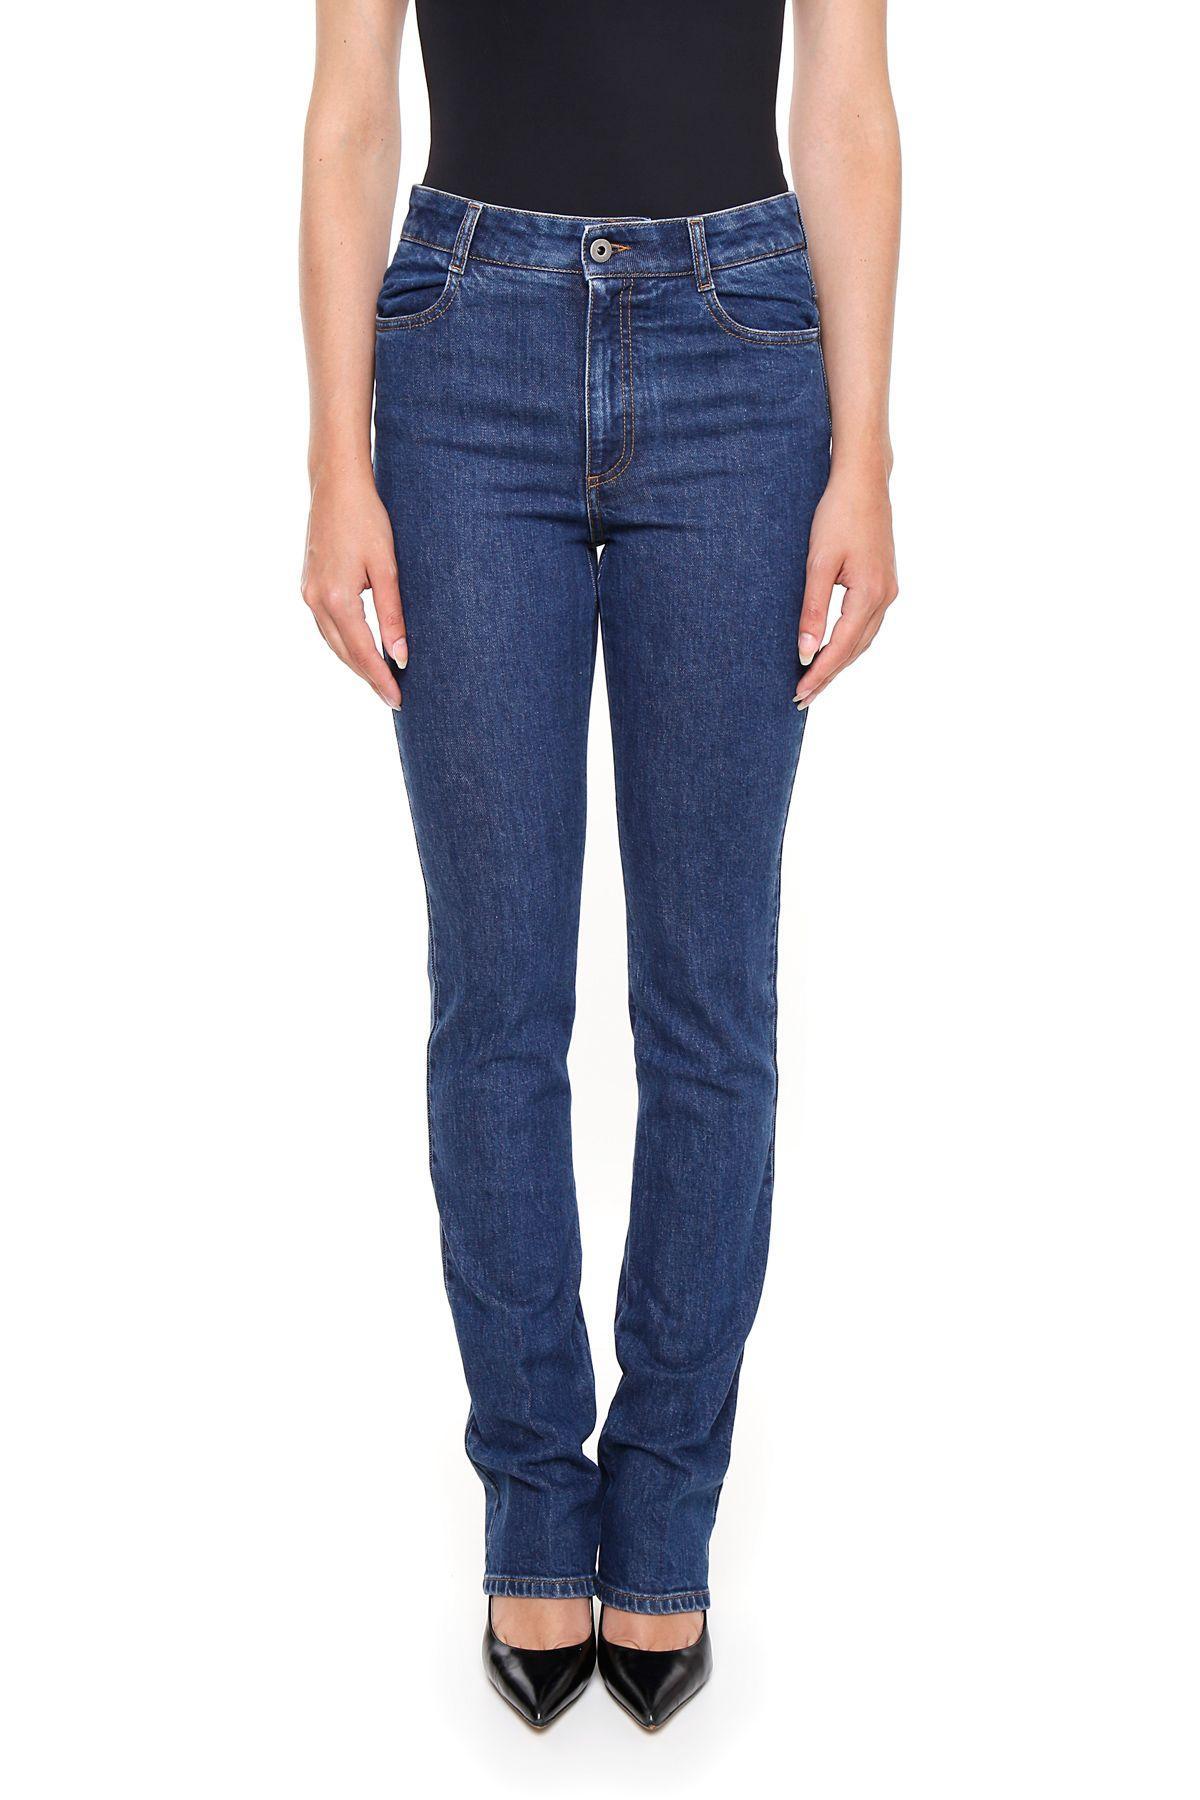 Stella Mccartney Malia Jeans In Midnight|blu